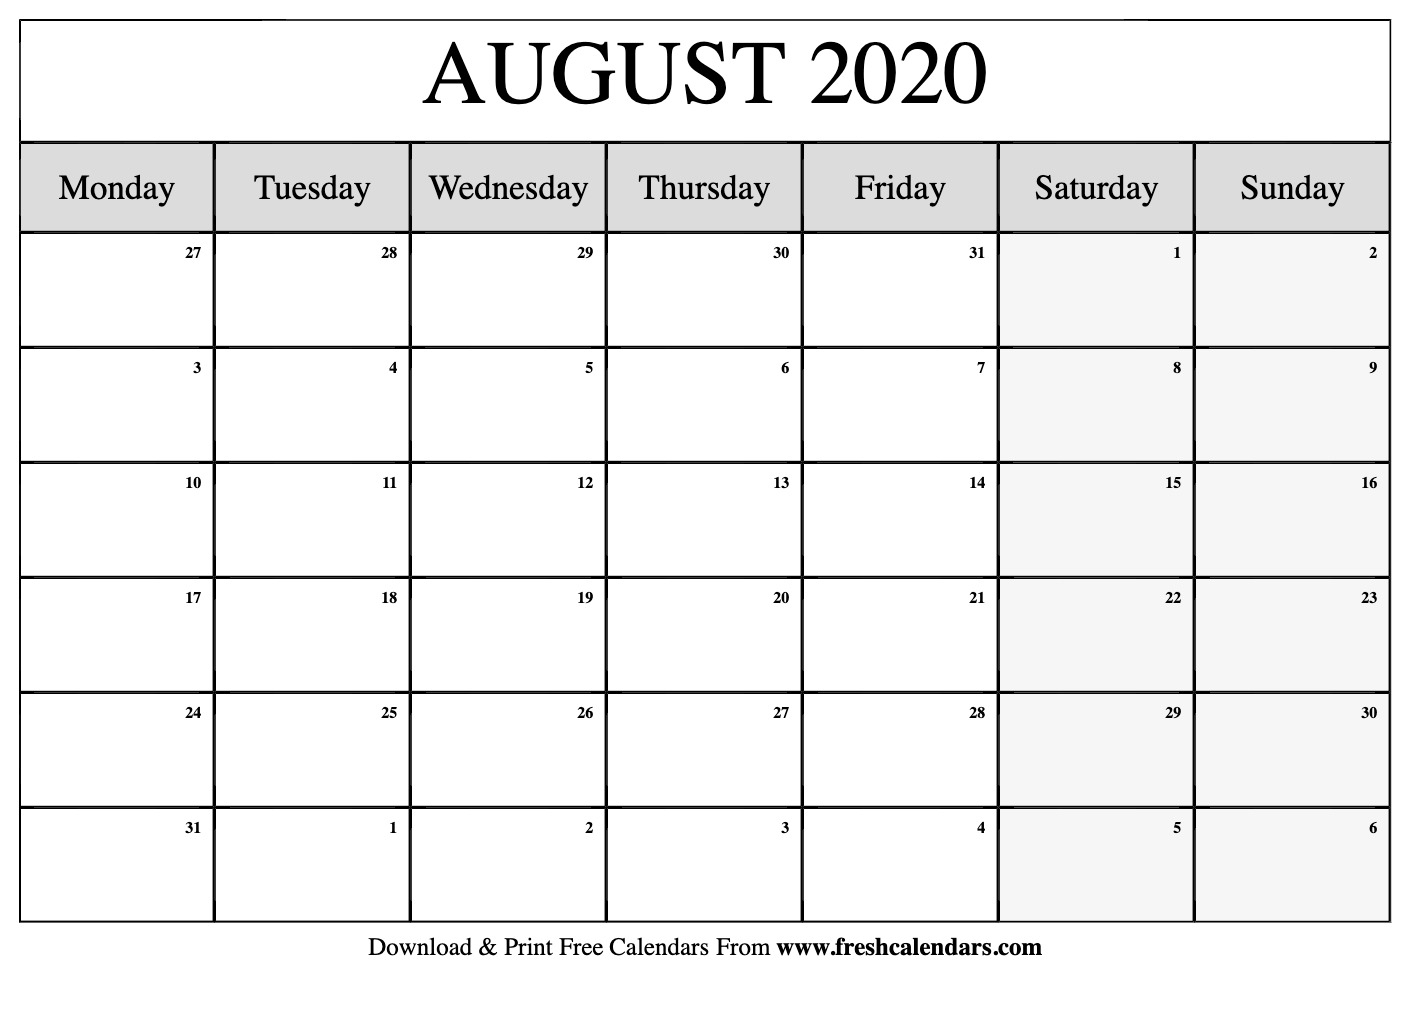 August 2020 Calendar Printable - Fresh Calendars